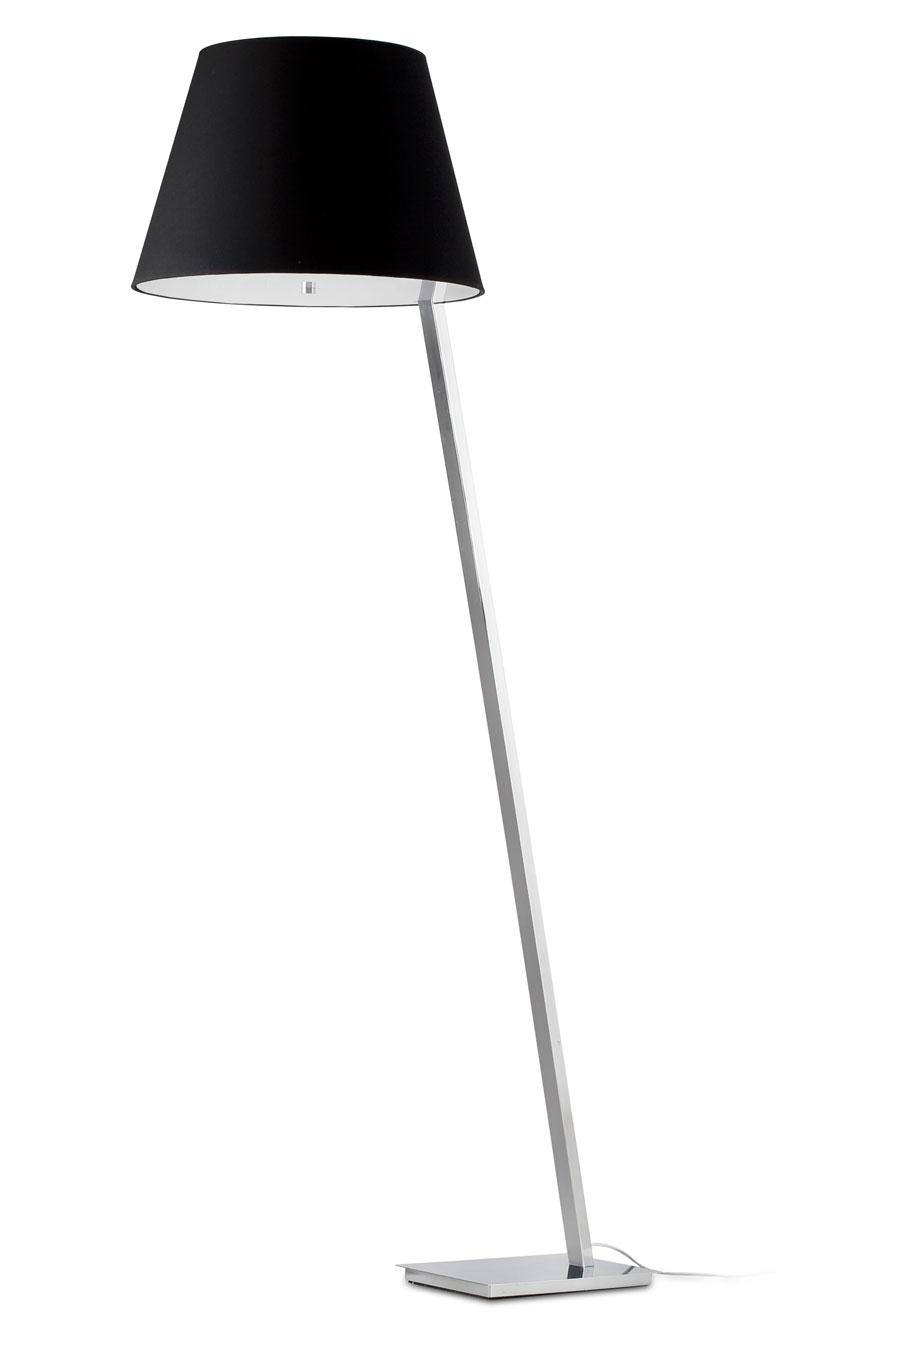 moma lampadaire design chrome et tissu noir faro style. Black Bedroom Furniture Sets. Home Design Ideas